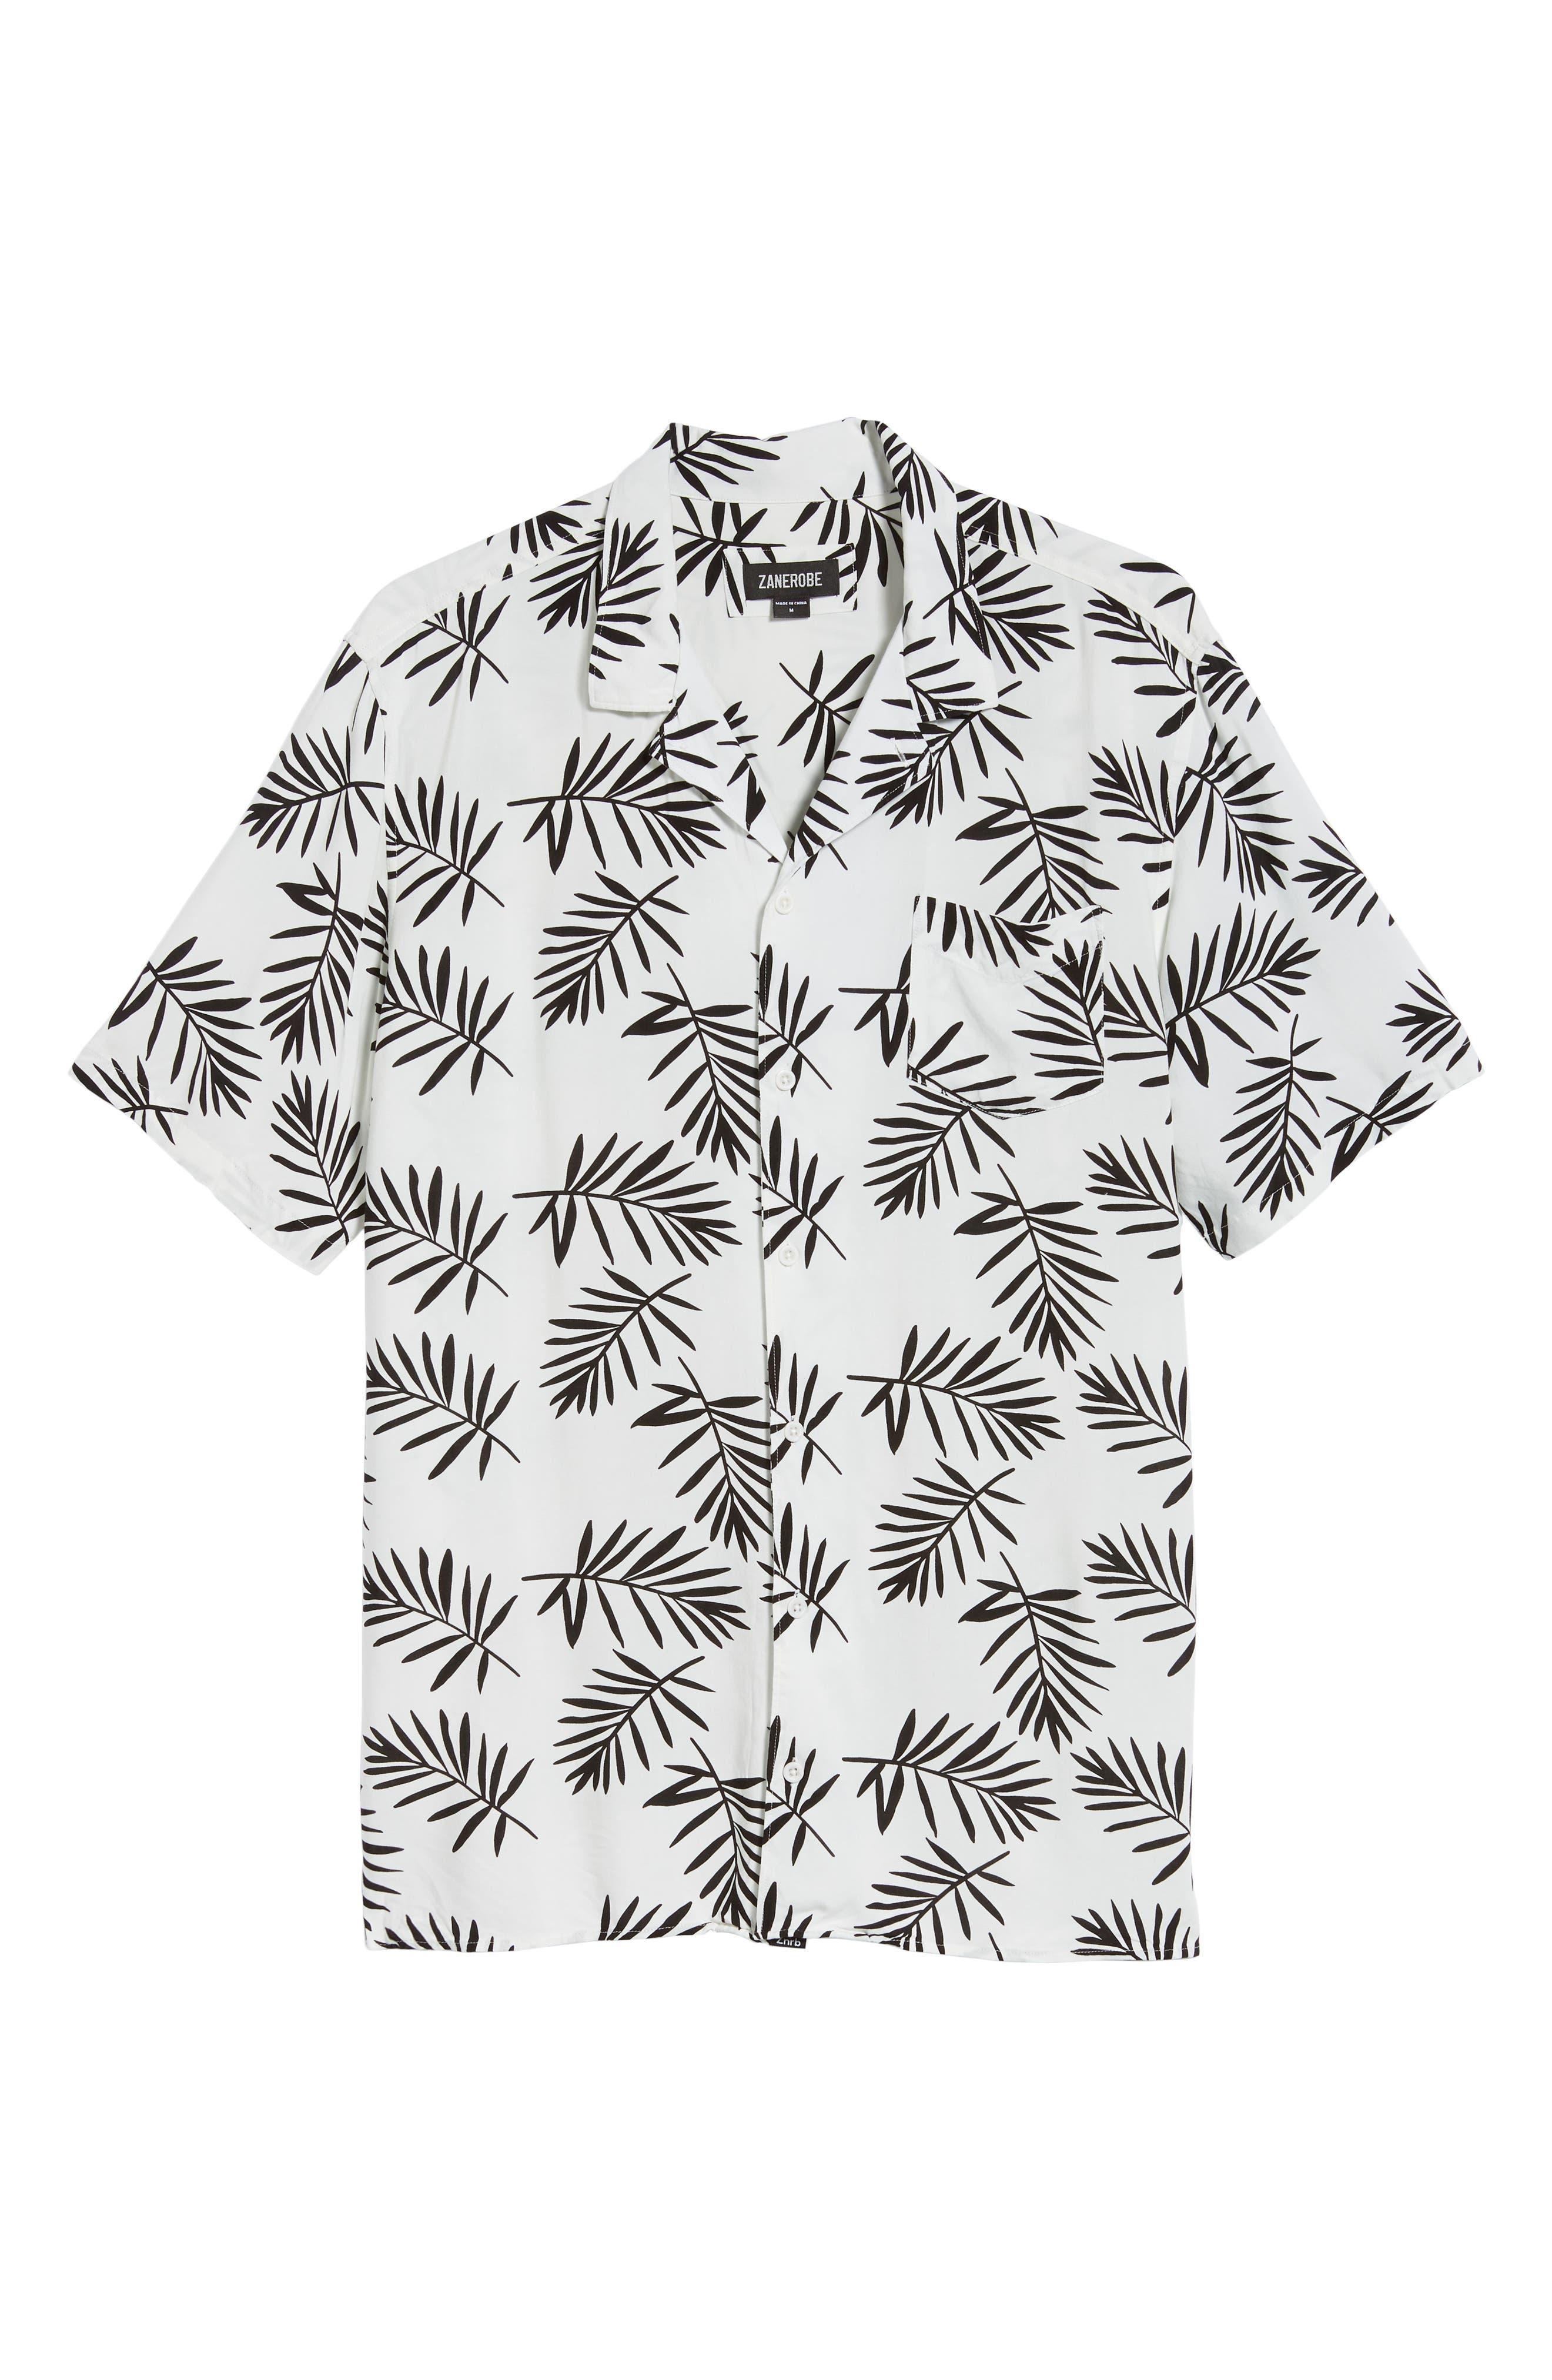 Paradise Short Sleeve Shirt,                             Alternate thumbnail 5, color,                             NAVY